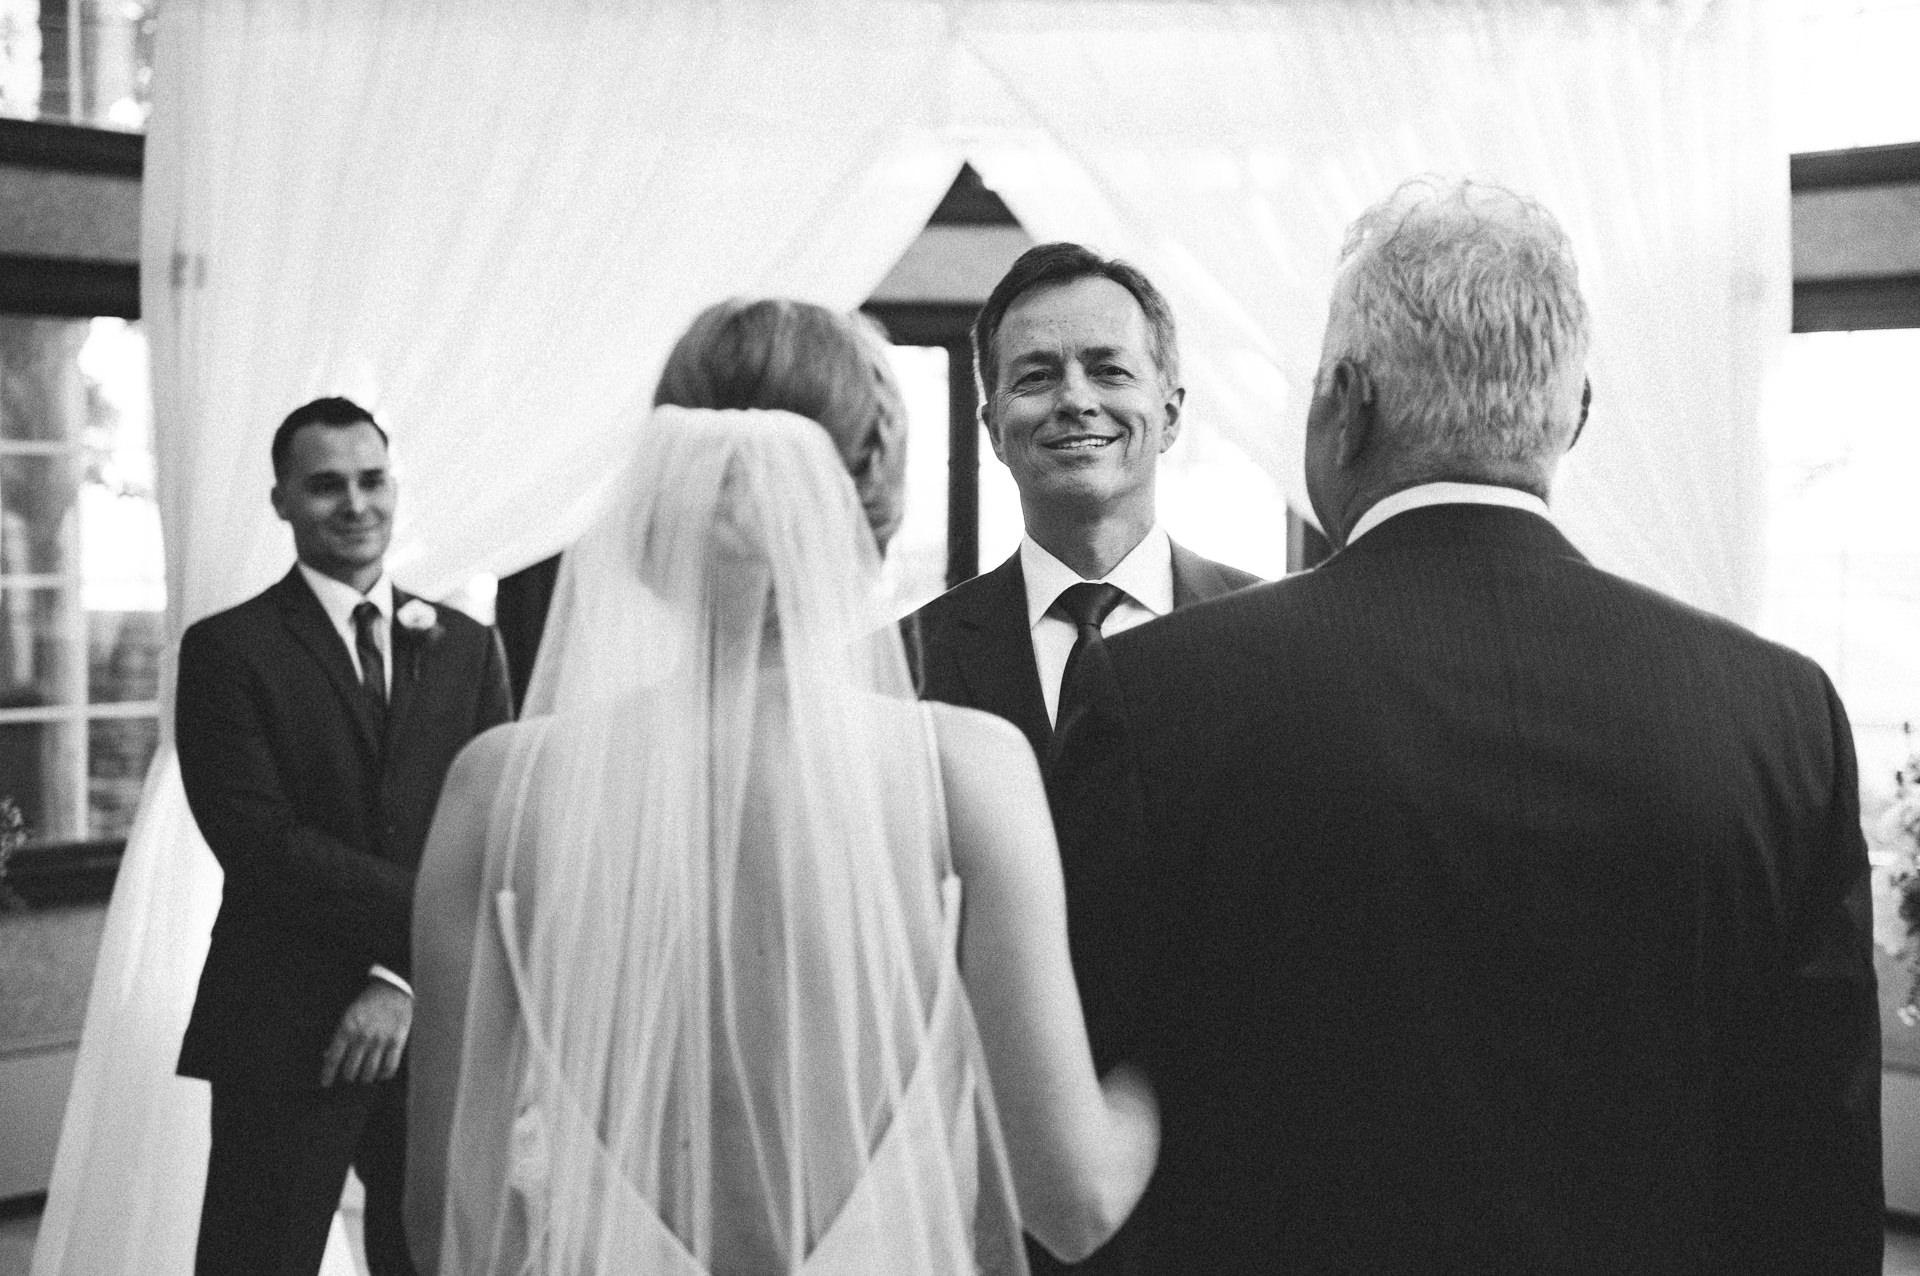 Bertram Inn Wedding Photographer in Aurora 1 50.jpg